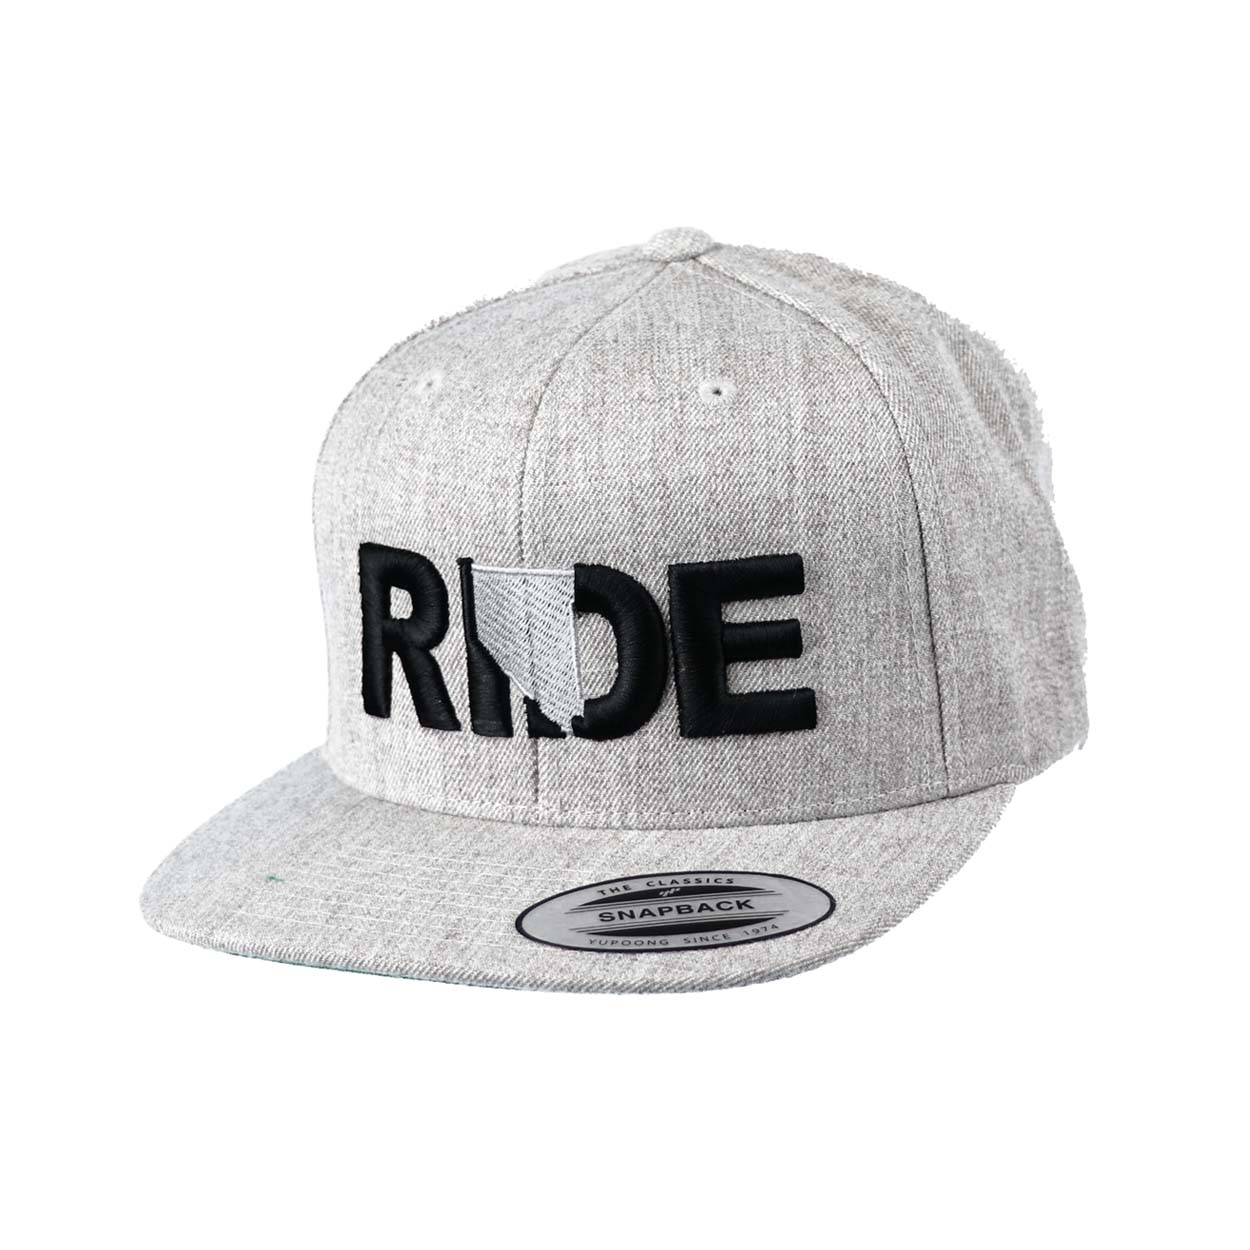 Ride Nevada Classic Embroidered  Snapback Flat Brim Hat Gray/Black